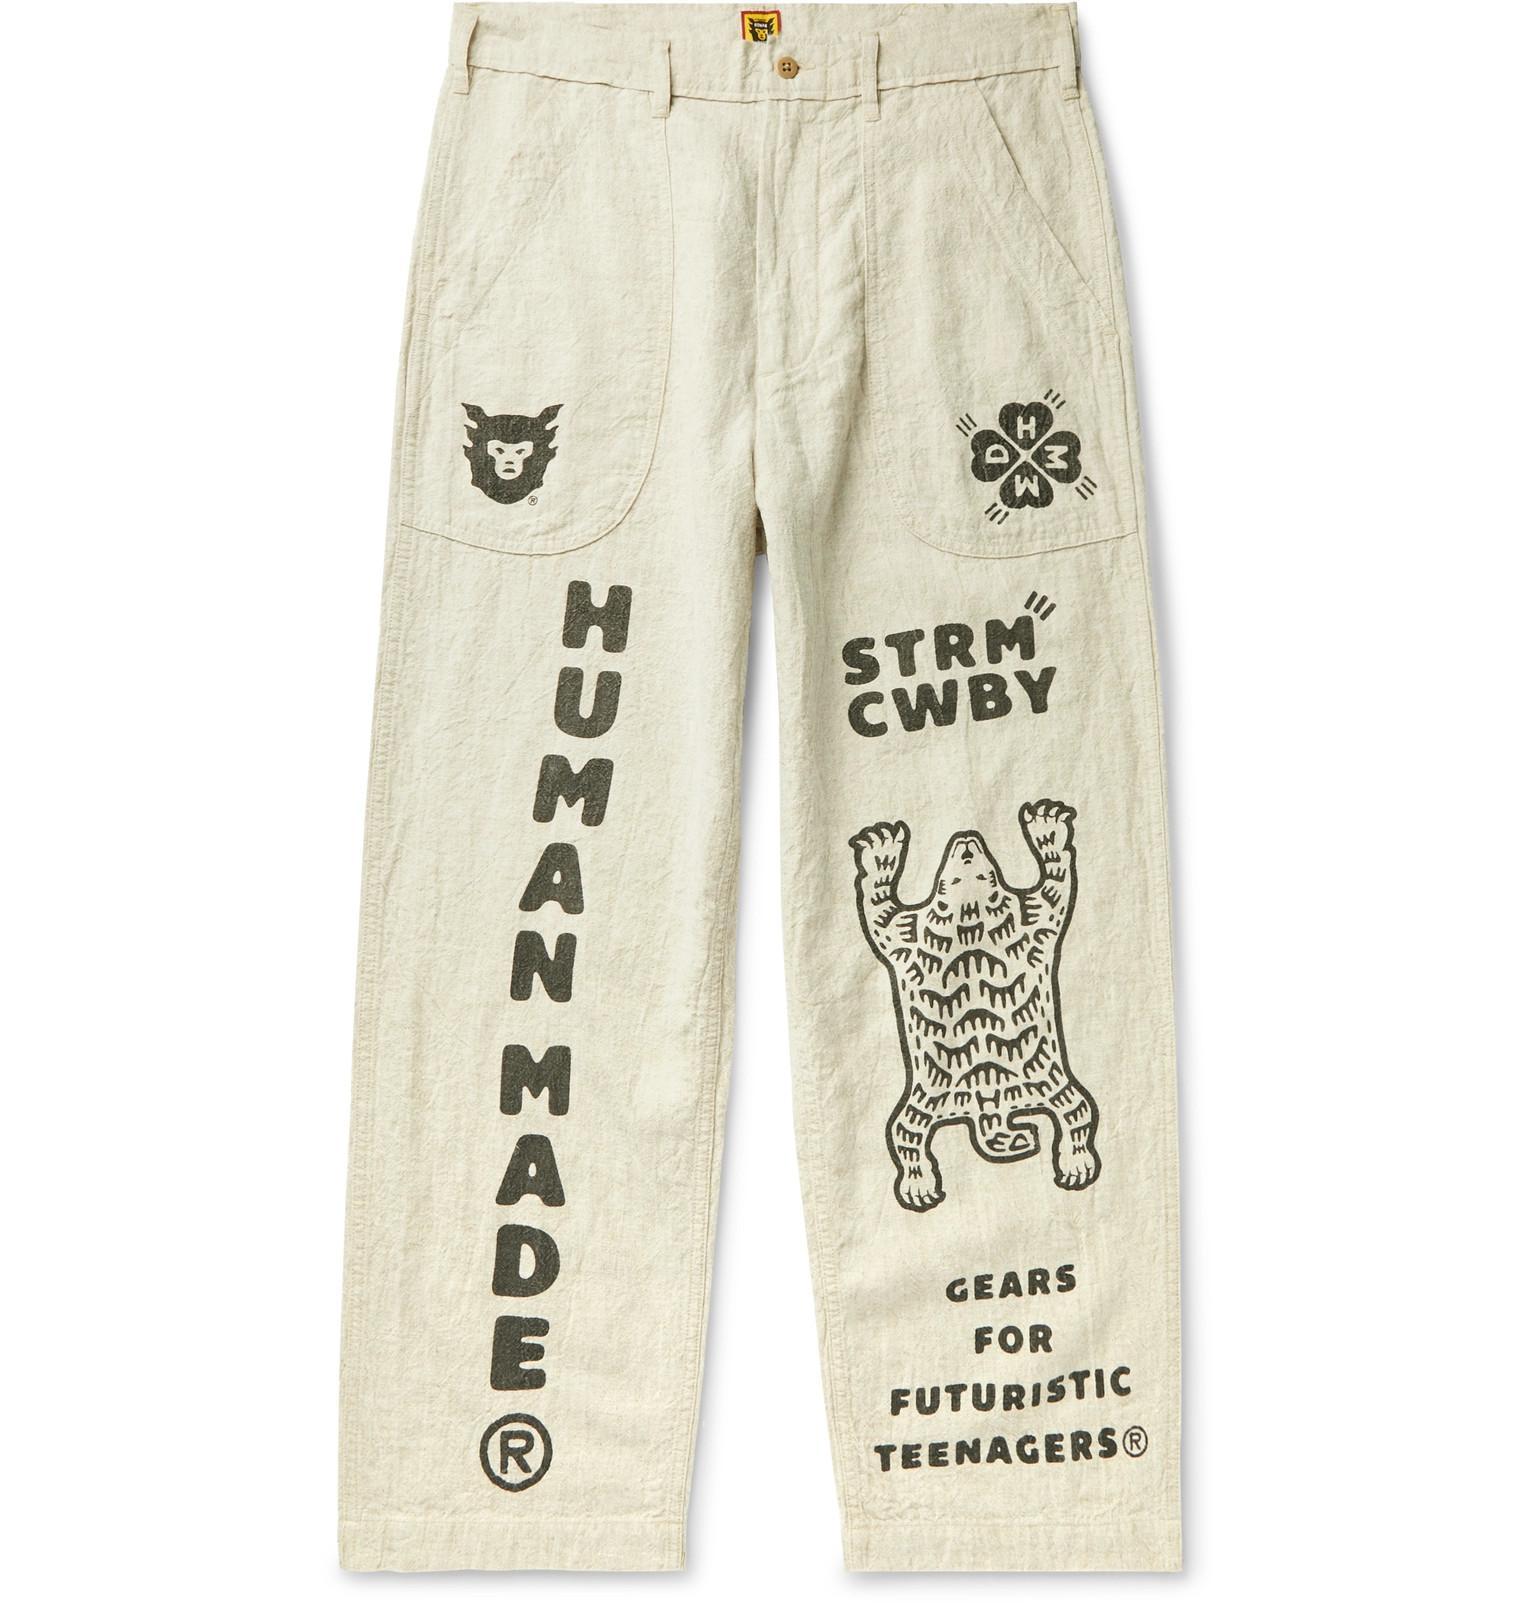 Mr.Macy Mens New Patchwork Printed Trousers Pants Casual Holes Pants Sweatpants